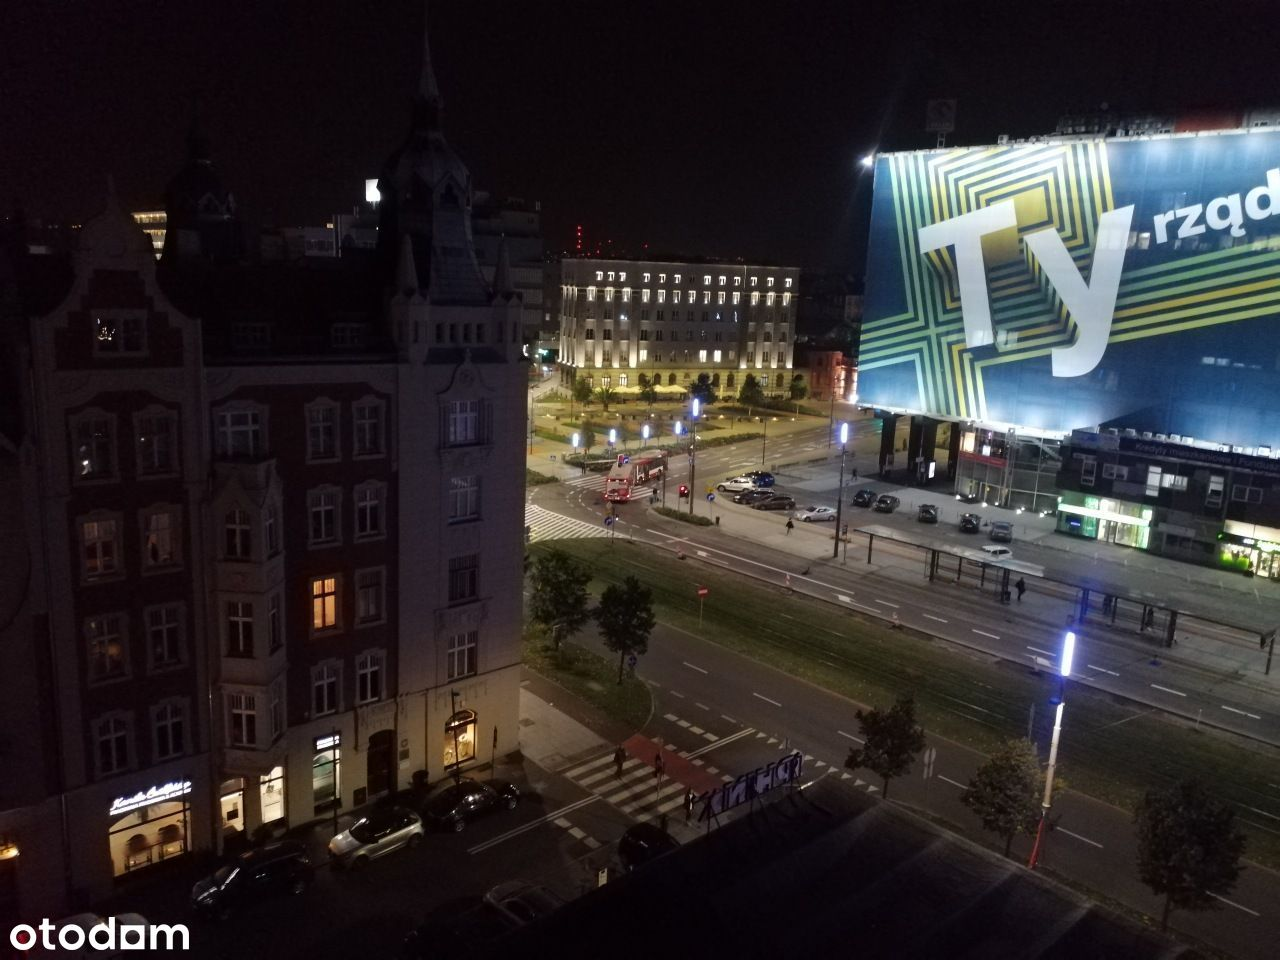 Kawalerka przy rynku /apartment at the town square